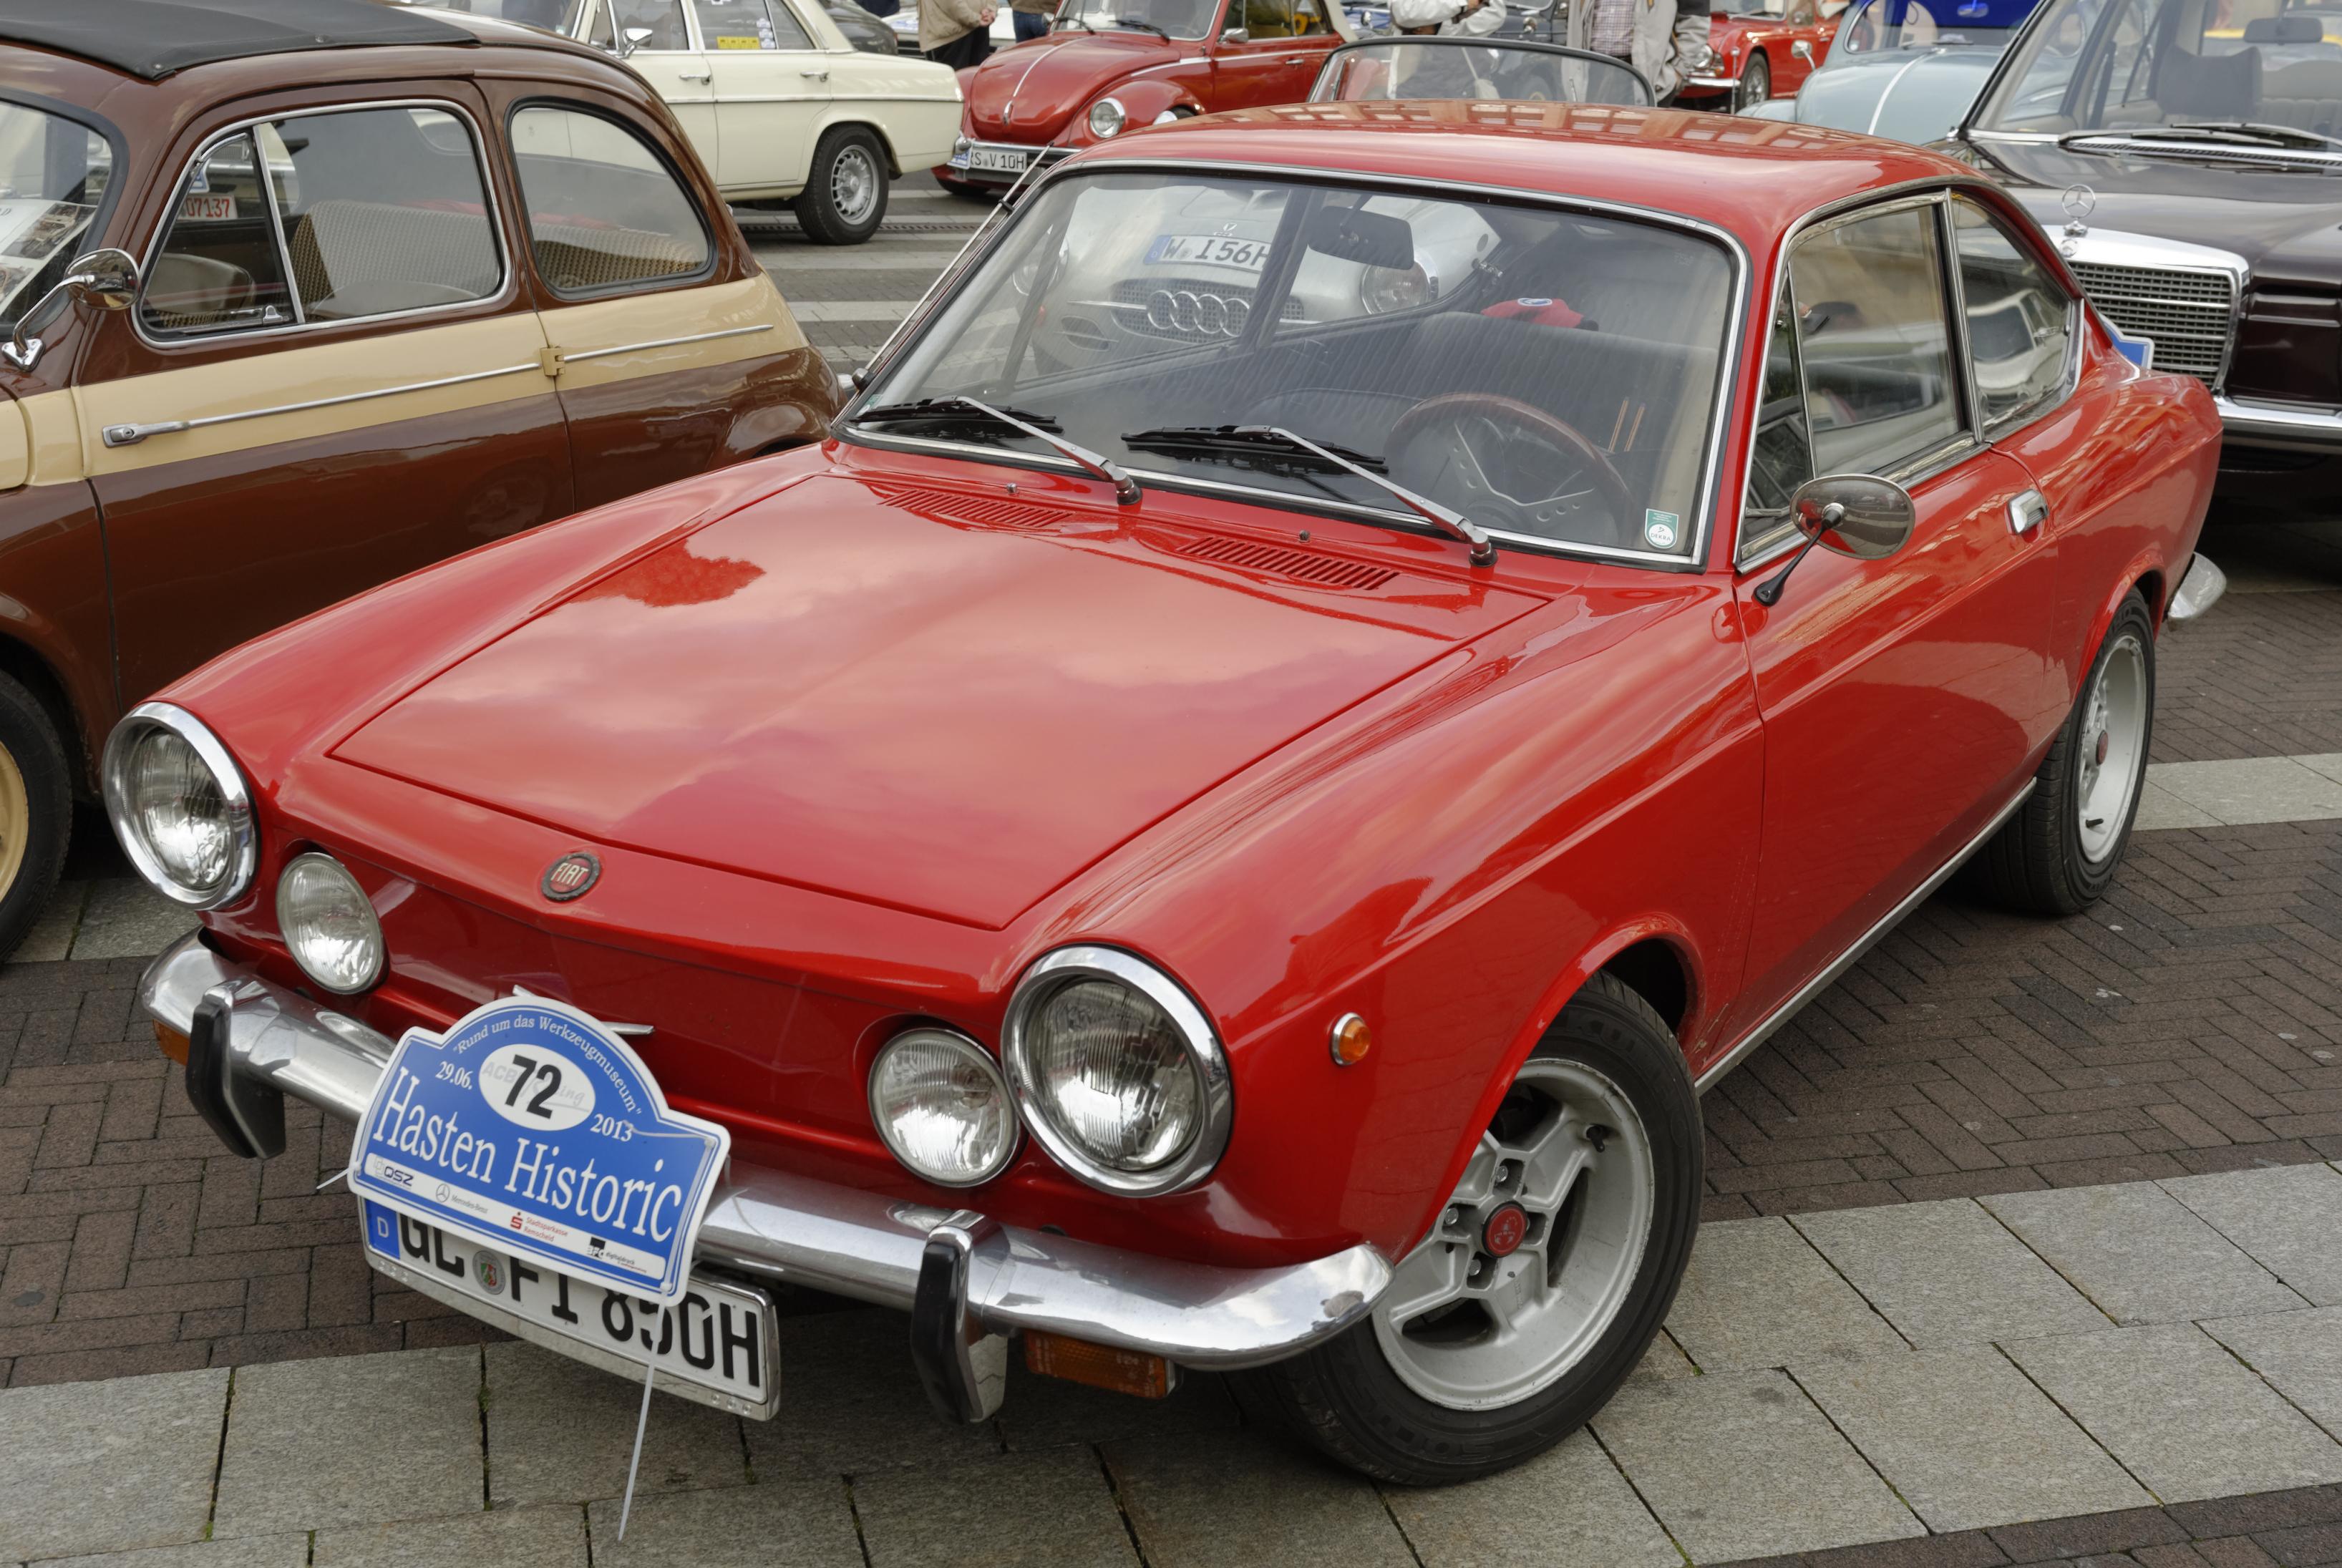 File:FIAT 850 Sport m.jpg - Wikimedia Commons